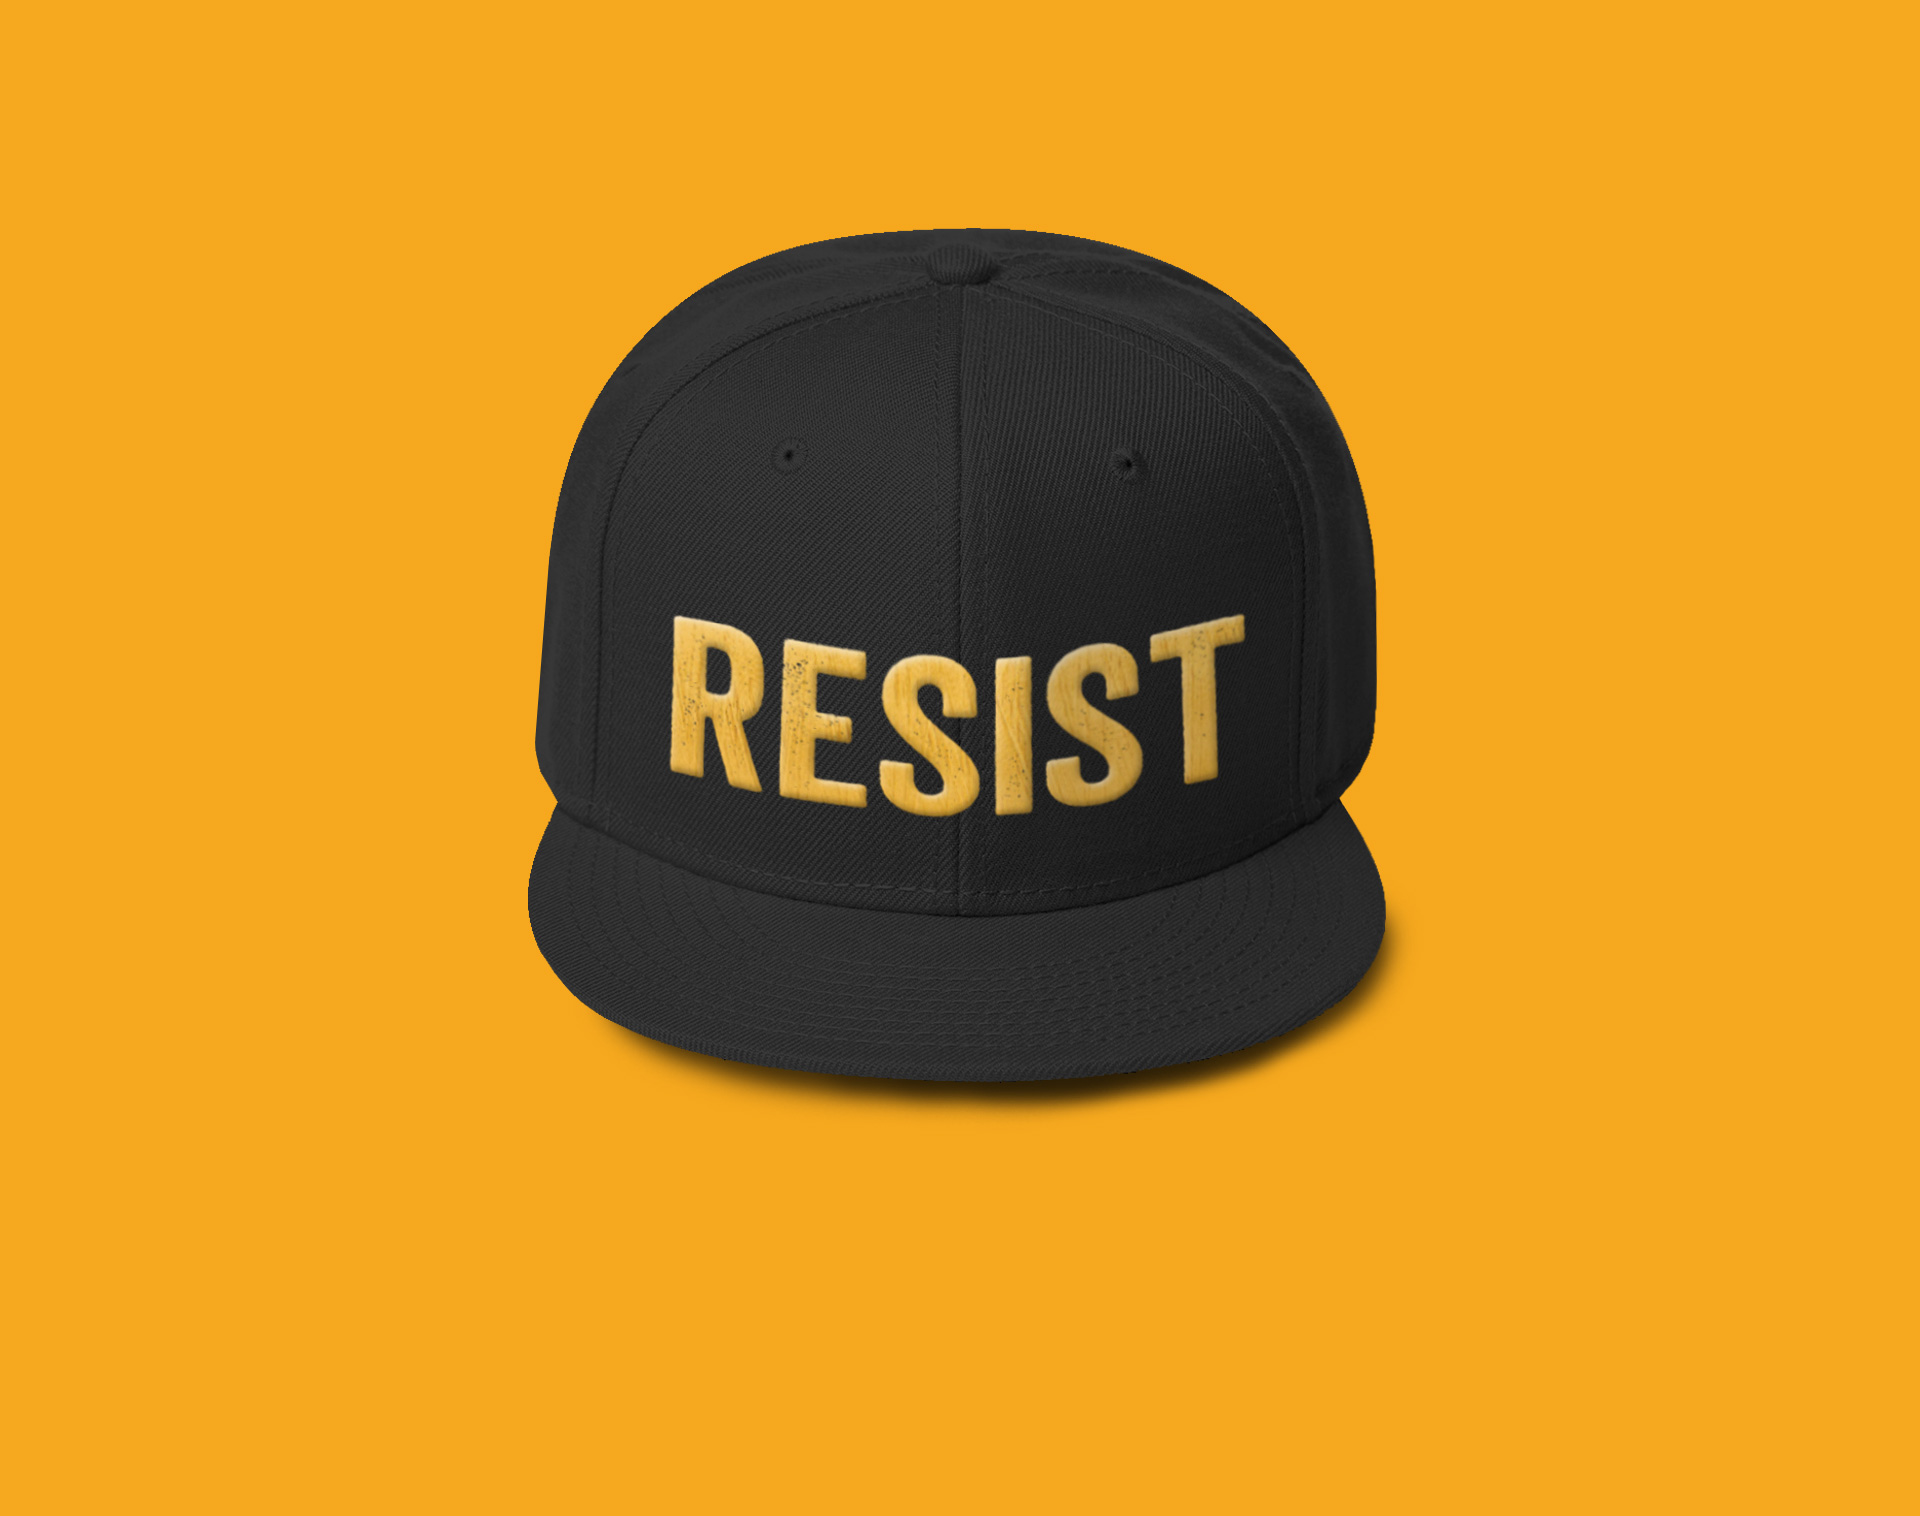 resist-hat-banner-1920